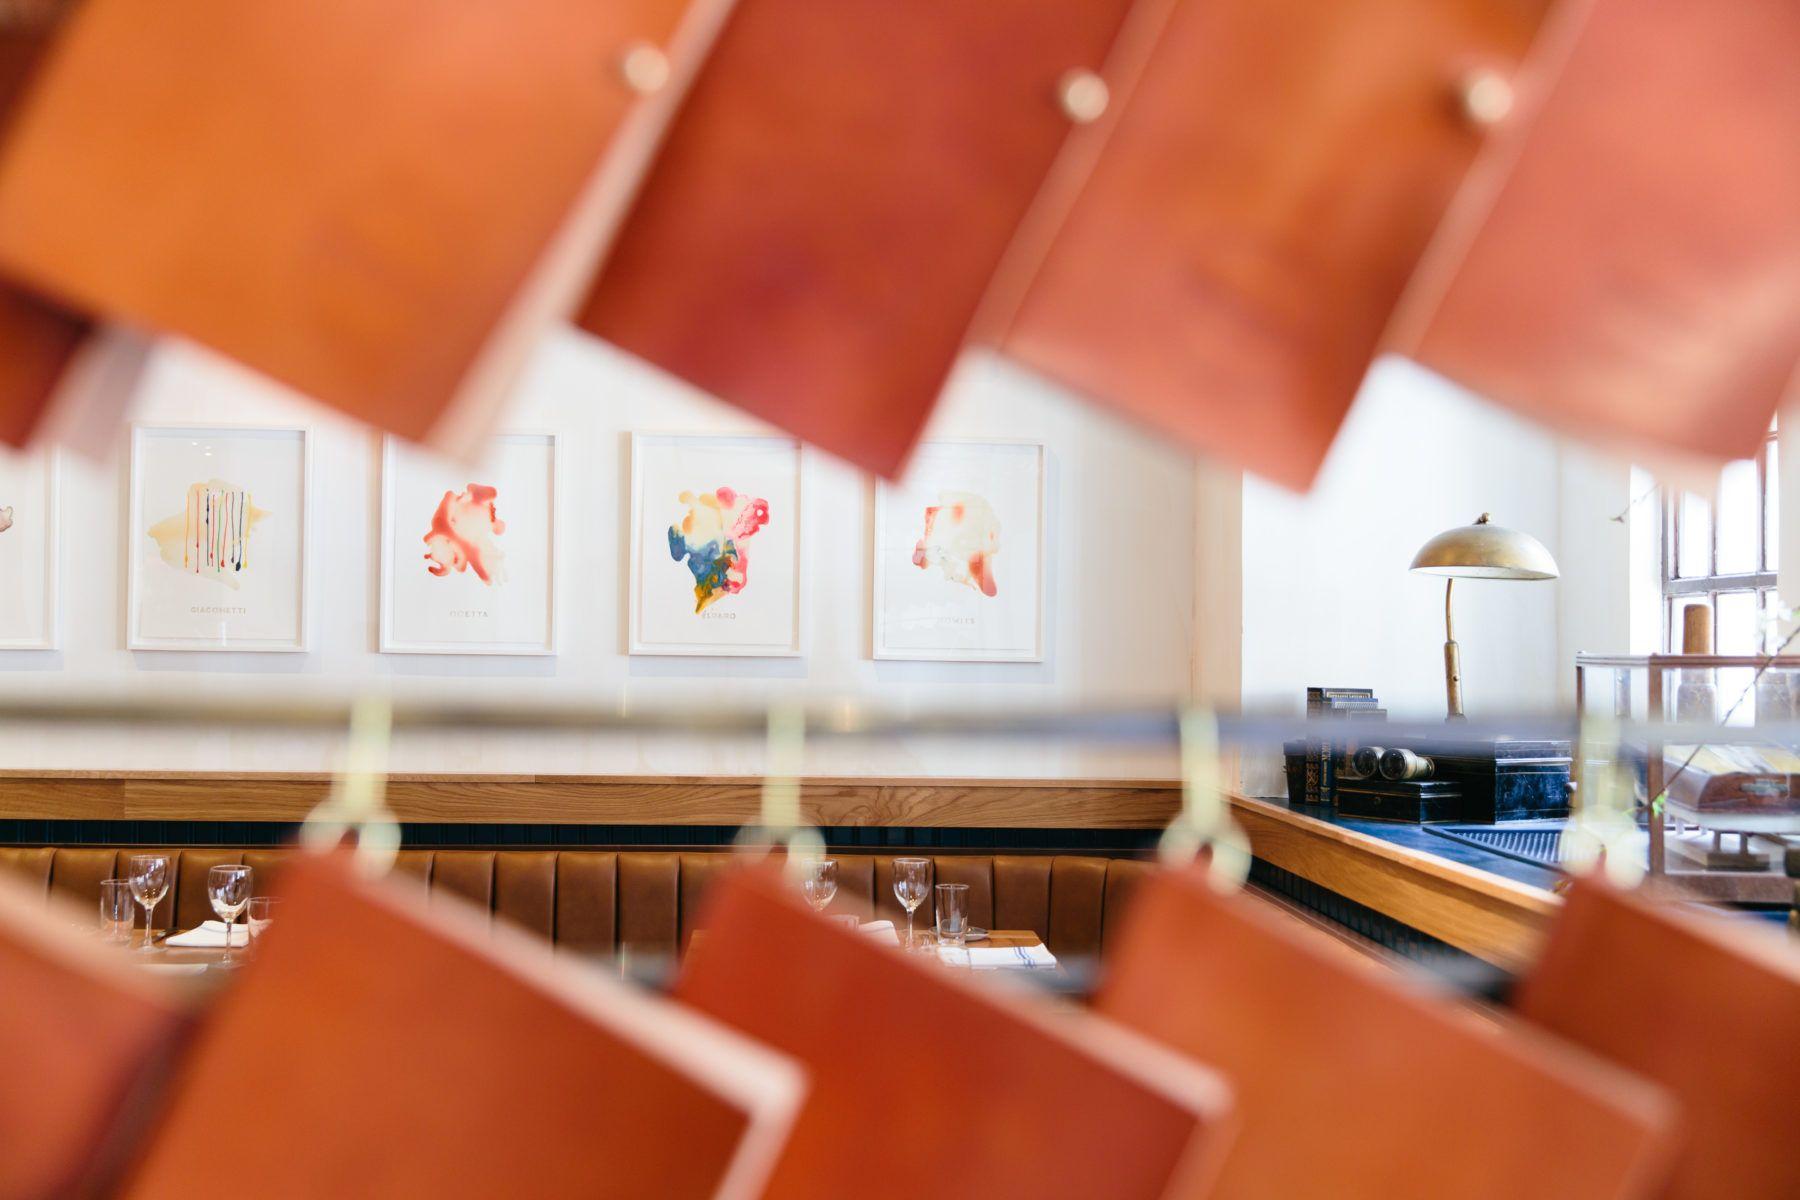 Bachetta Restaurant interior, colorful art on the wall